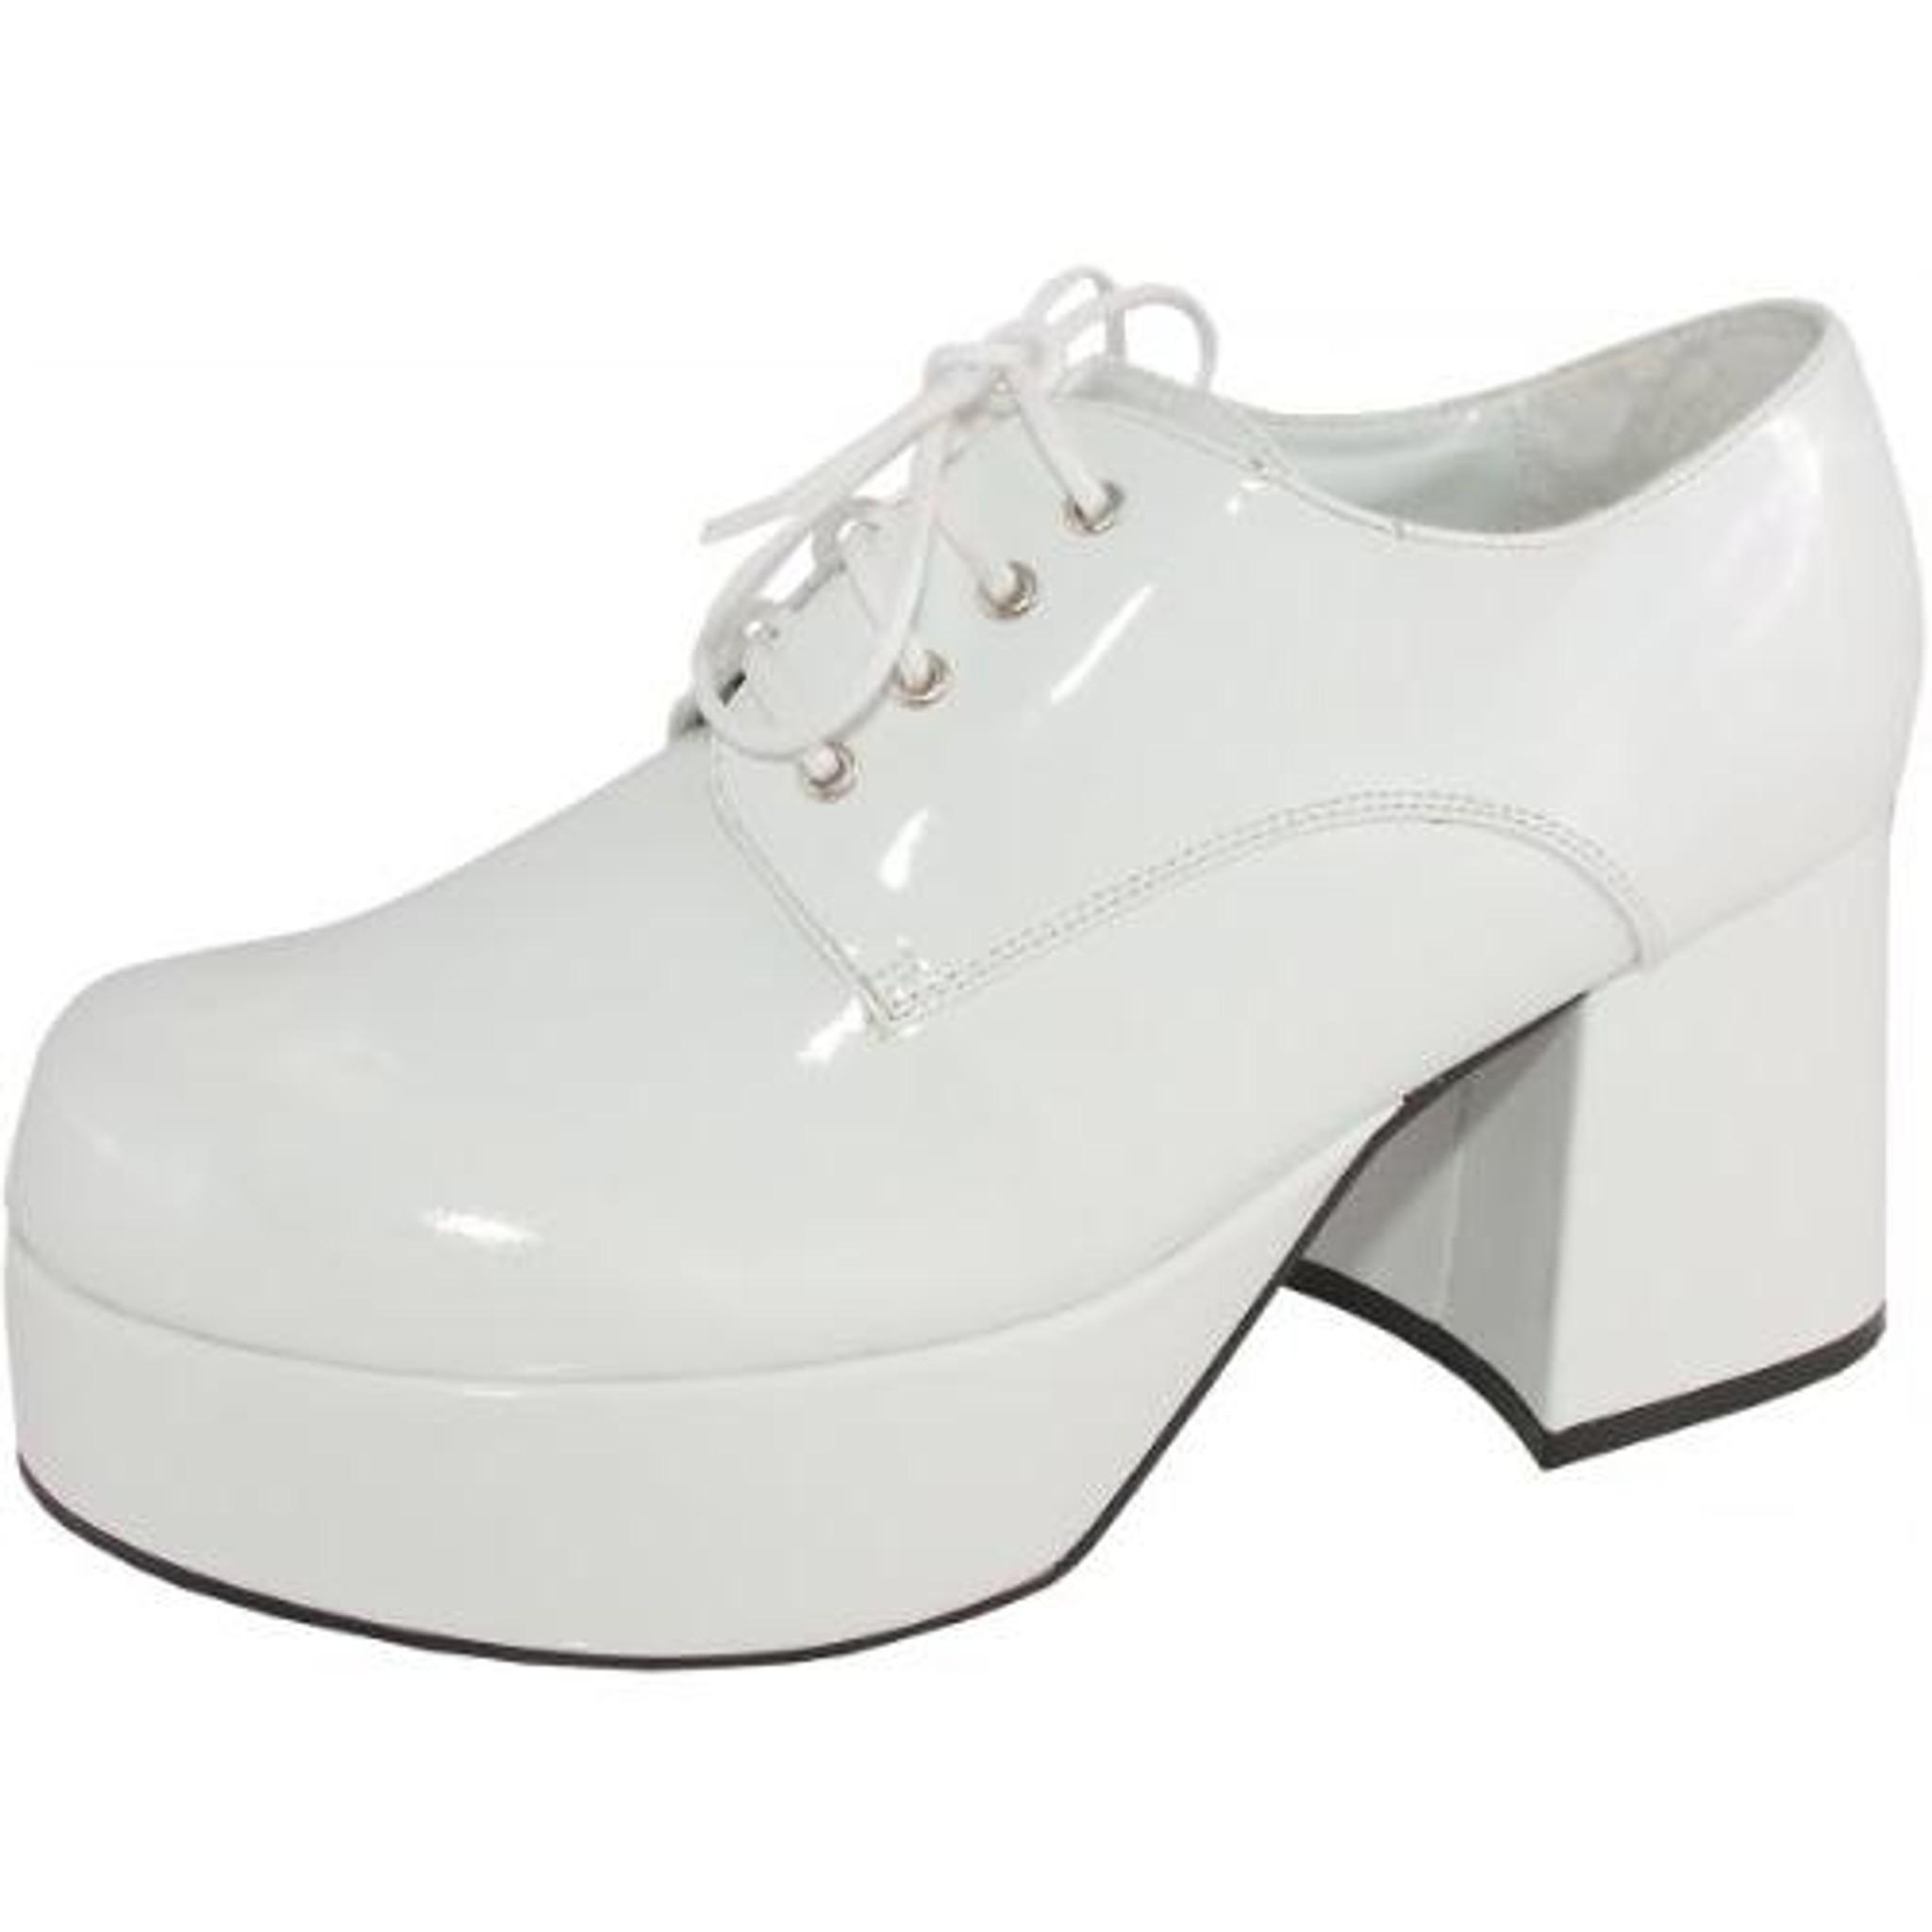 mens white platform shoes